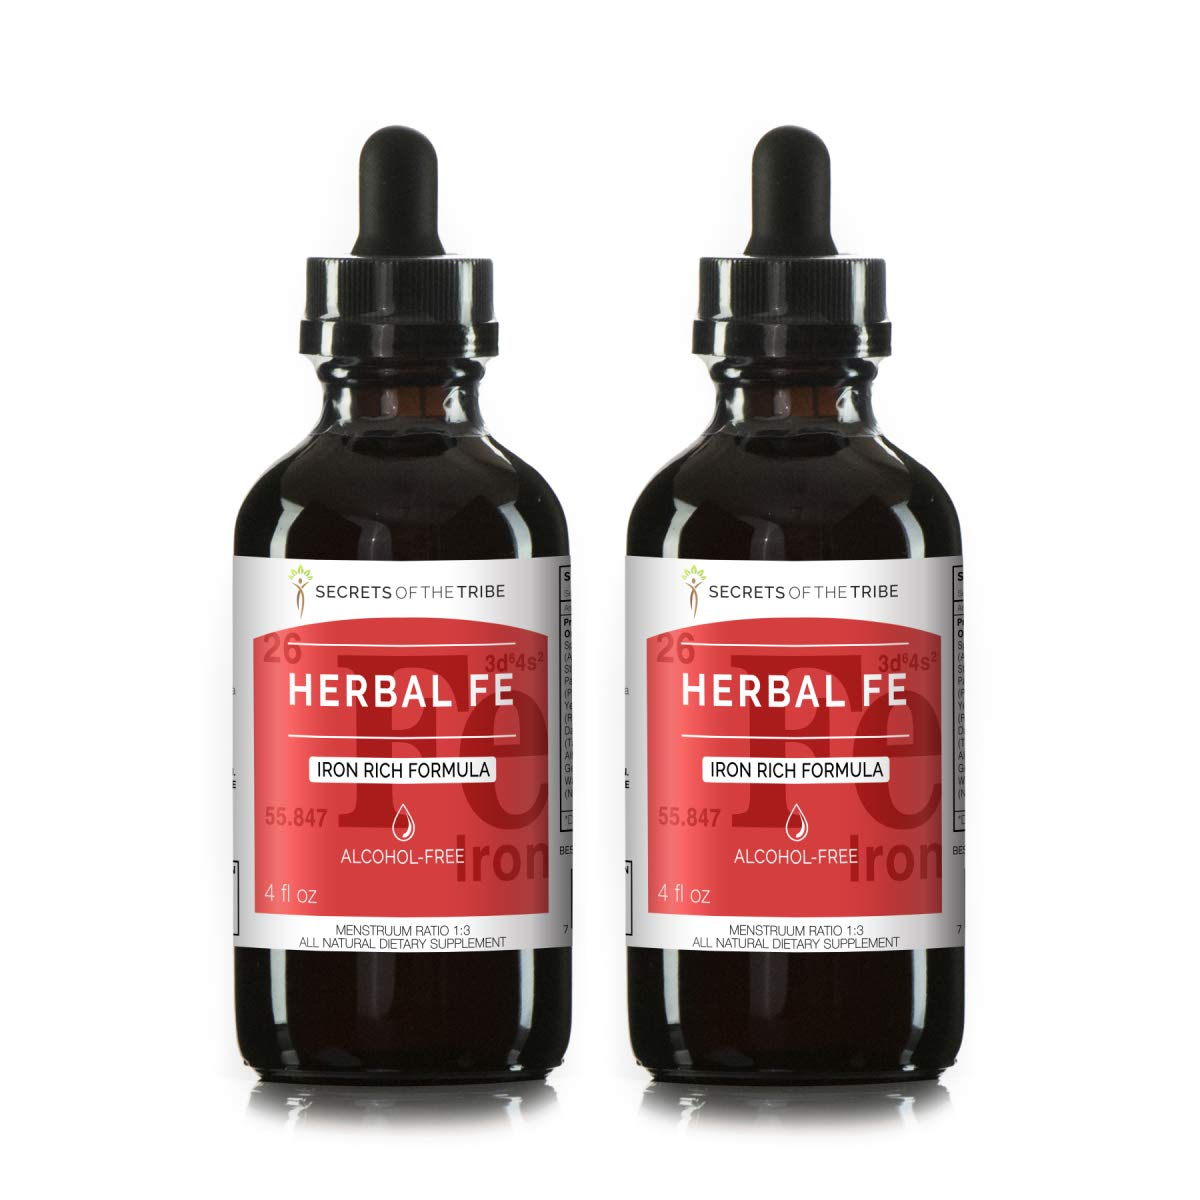 Herbal Fe Alcohol-Free Extract, Tincture, Glycerite Spirulina, Stinging Nettle, Parsley, Yellow Dock, Dandelion, Alfalfa, Gentian, Watercress. Iron Rich Formula (2x4 FL OZ)